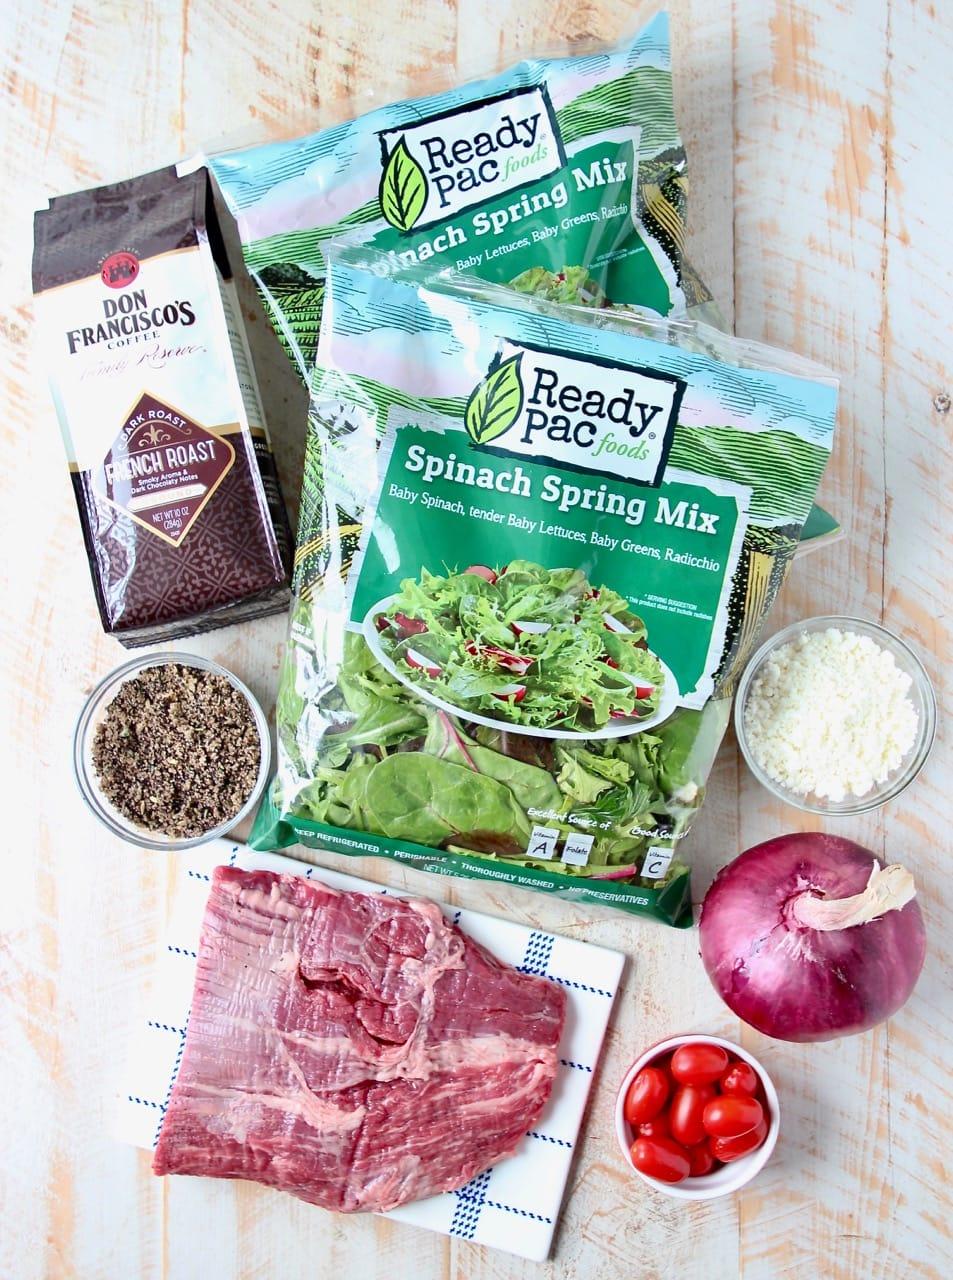 Ingredients for a steak salad